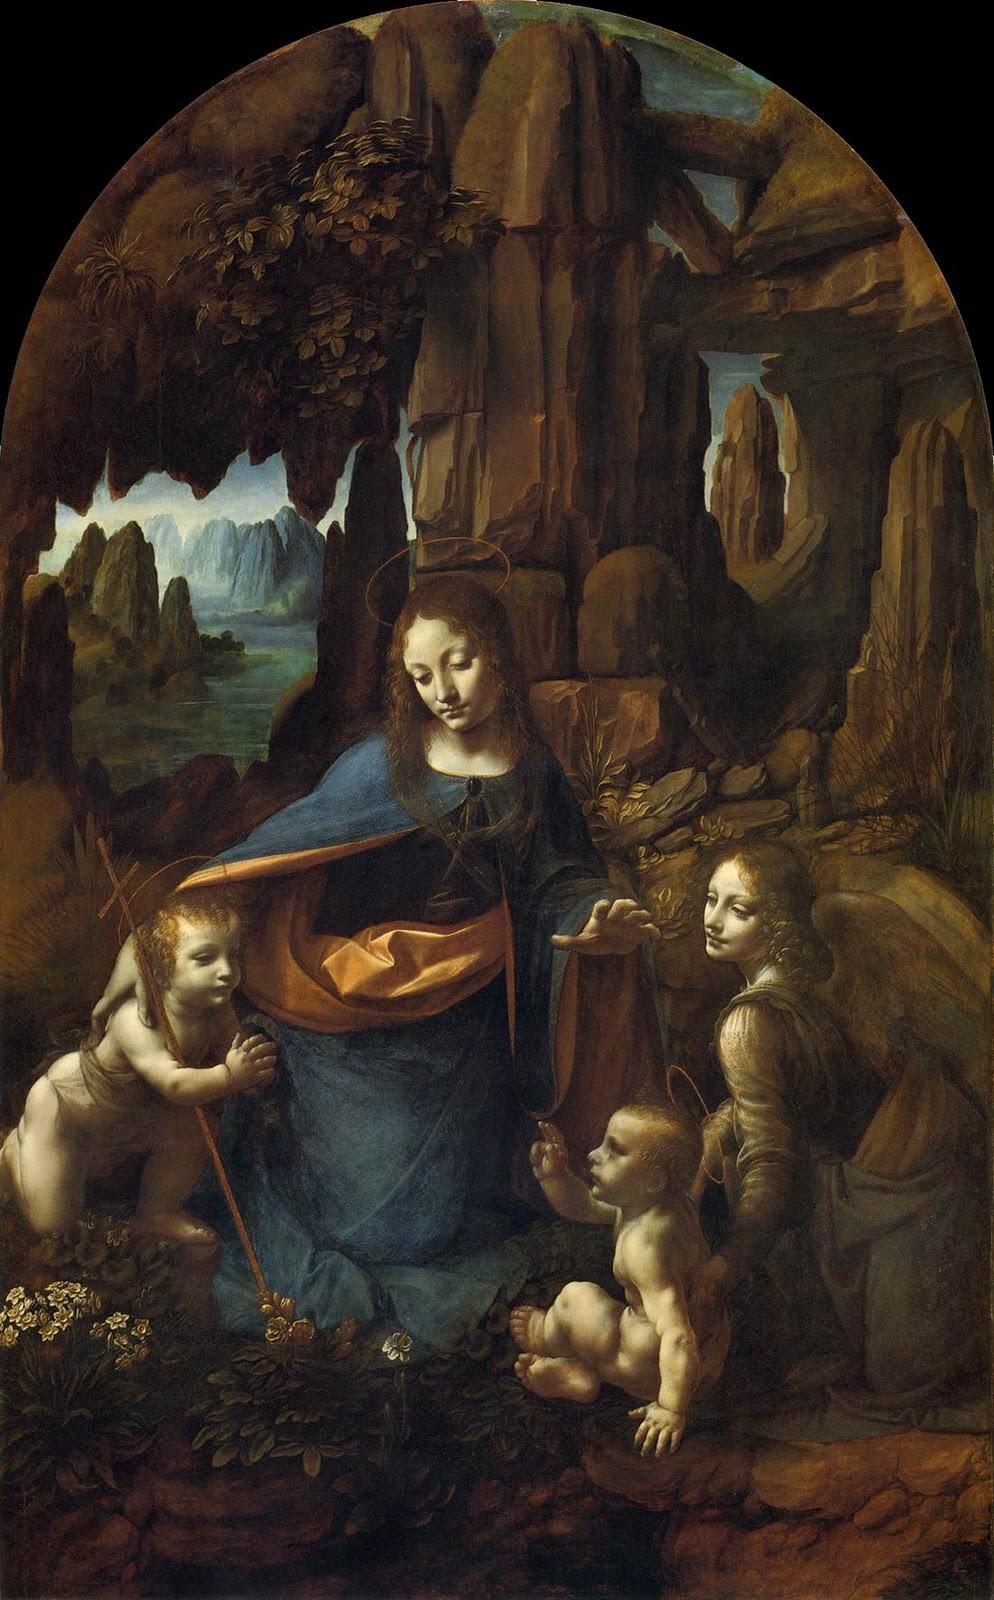 Leonardo da Vinci, Virgin of the Rocks, c. 1483-1486, Musee du Louvre, Paris